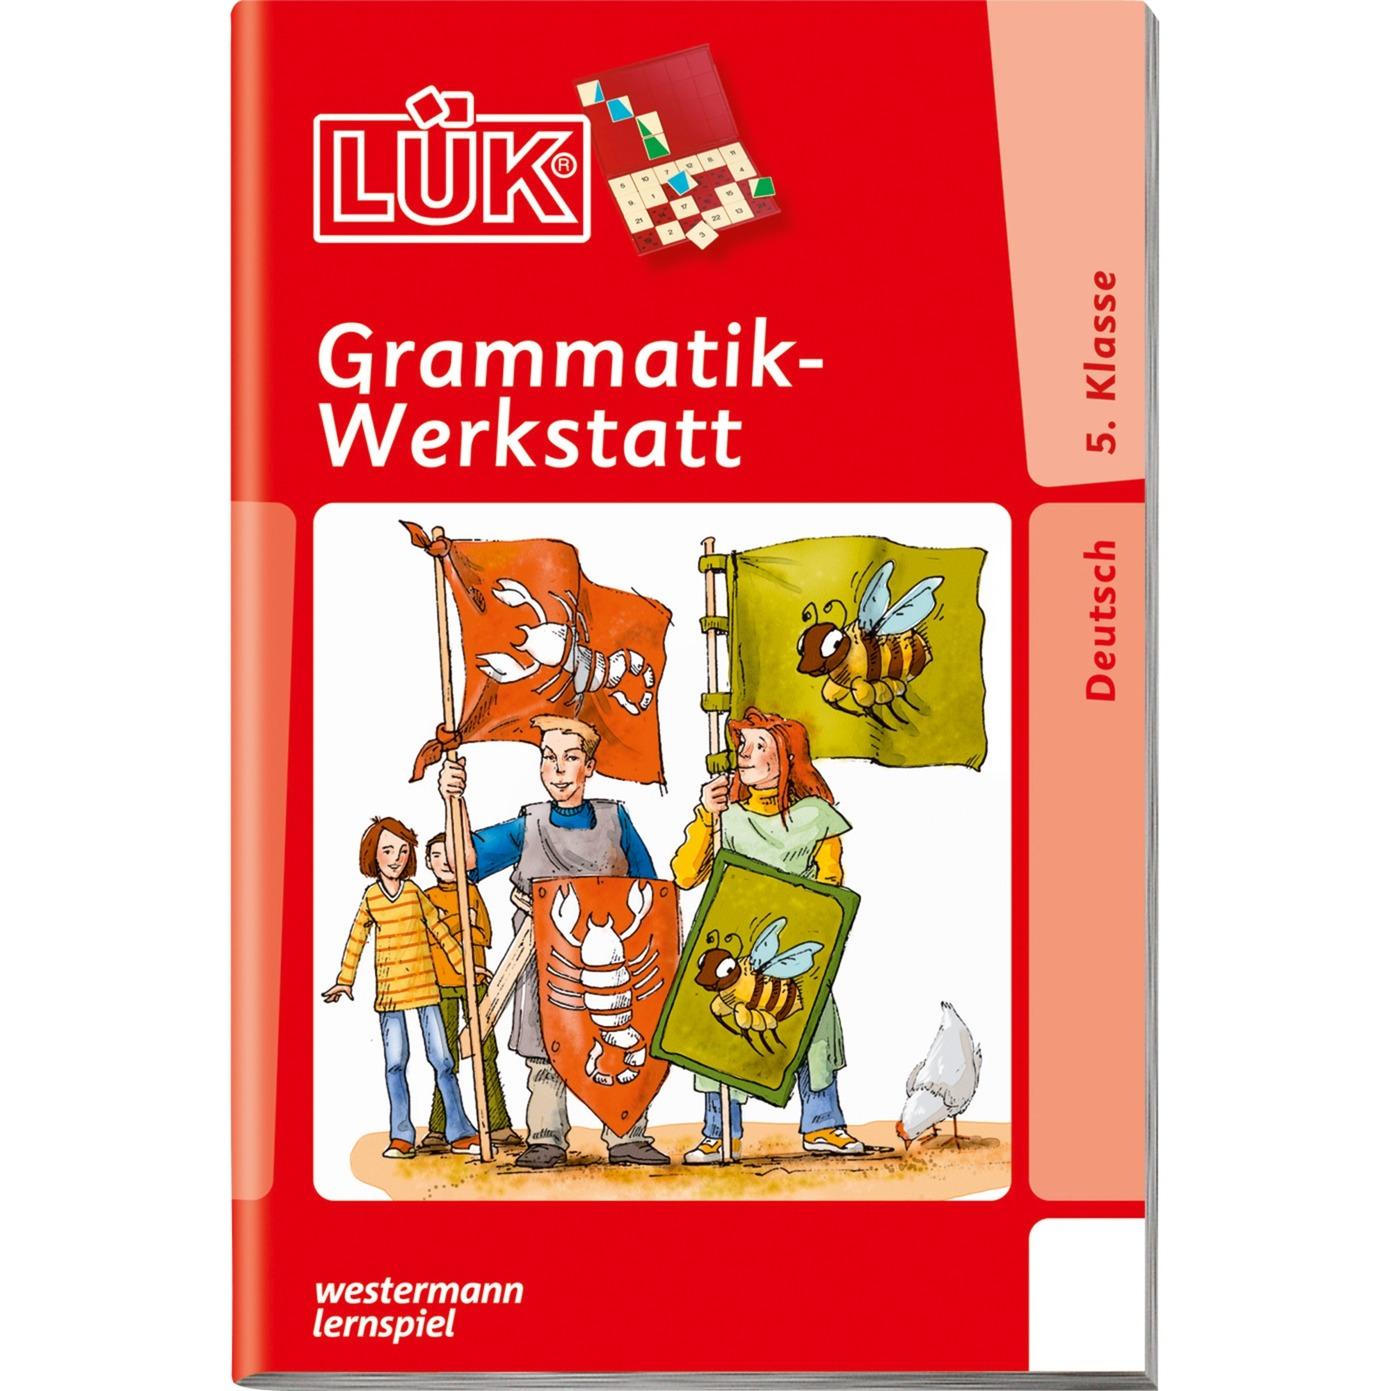 WESTERMANN LÜK-Heft: Grammatik-Werkstatt 5. Klasse, Lernbuch